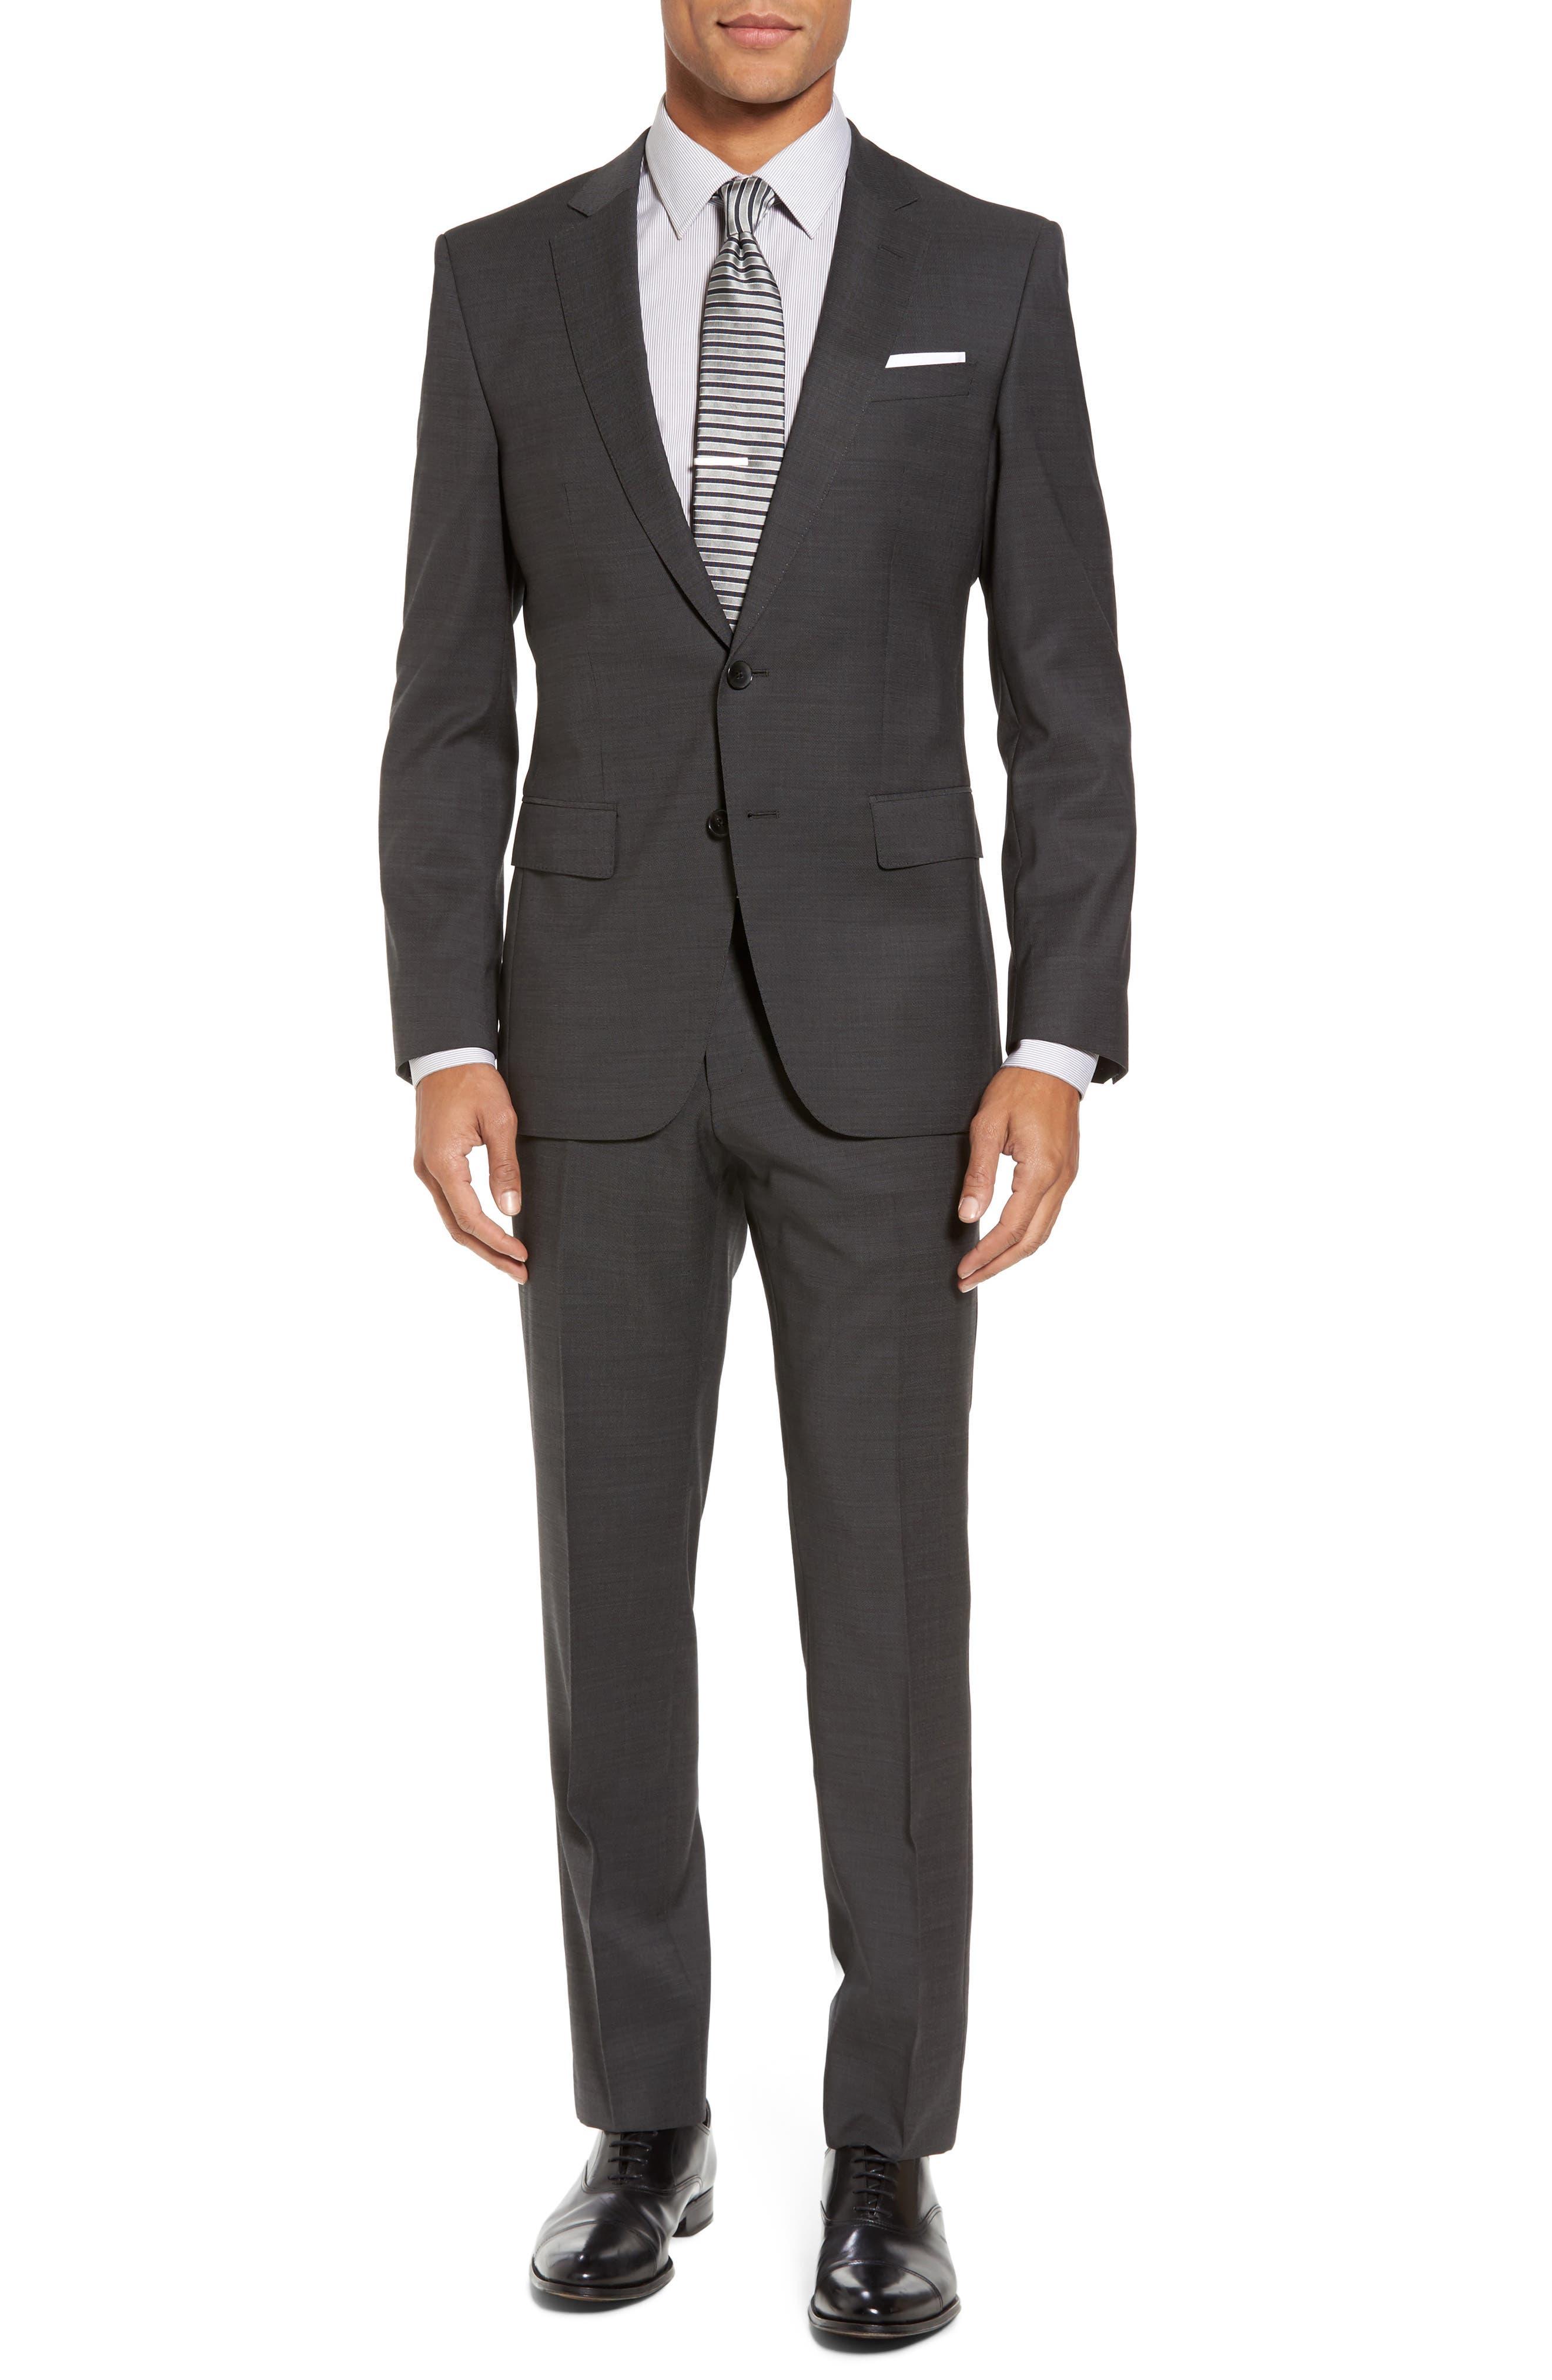 Main Image - BOSS Huge/Genius Trim Fit Solid Wool Suit